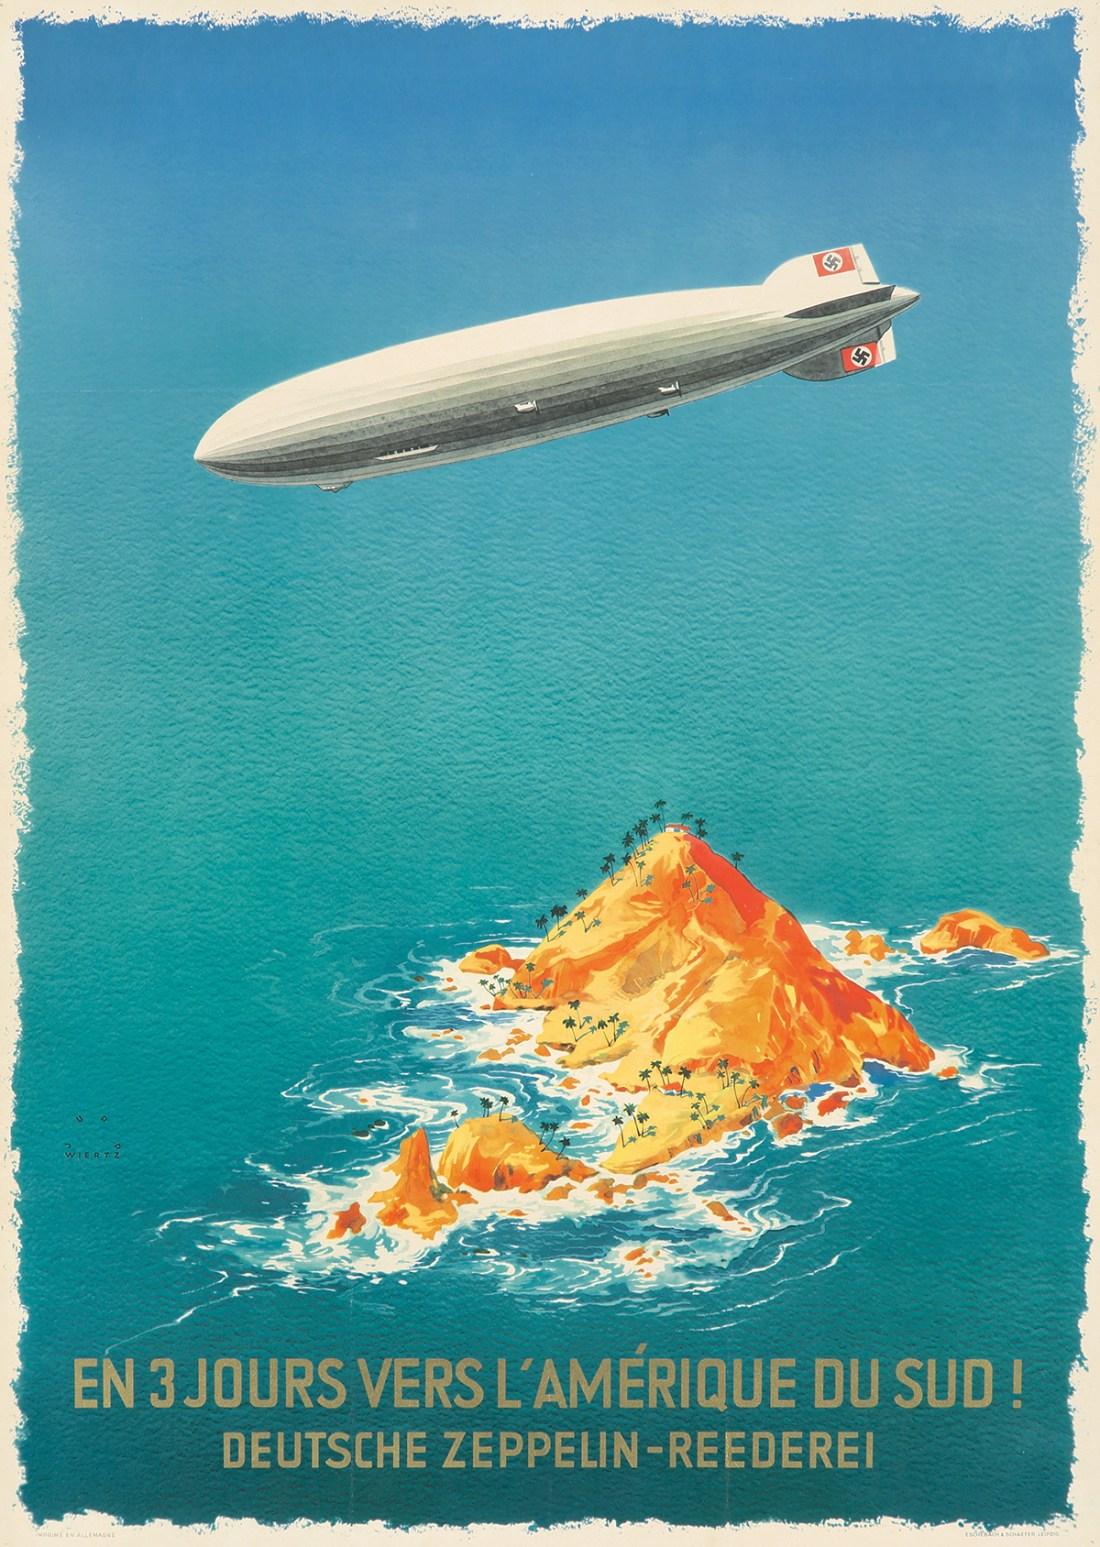 Poster advertising the Deutsche Zeppelin-Reederei which made transatlantic flights to Brazil. ca. 1936.